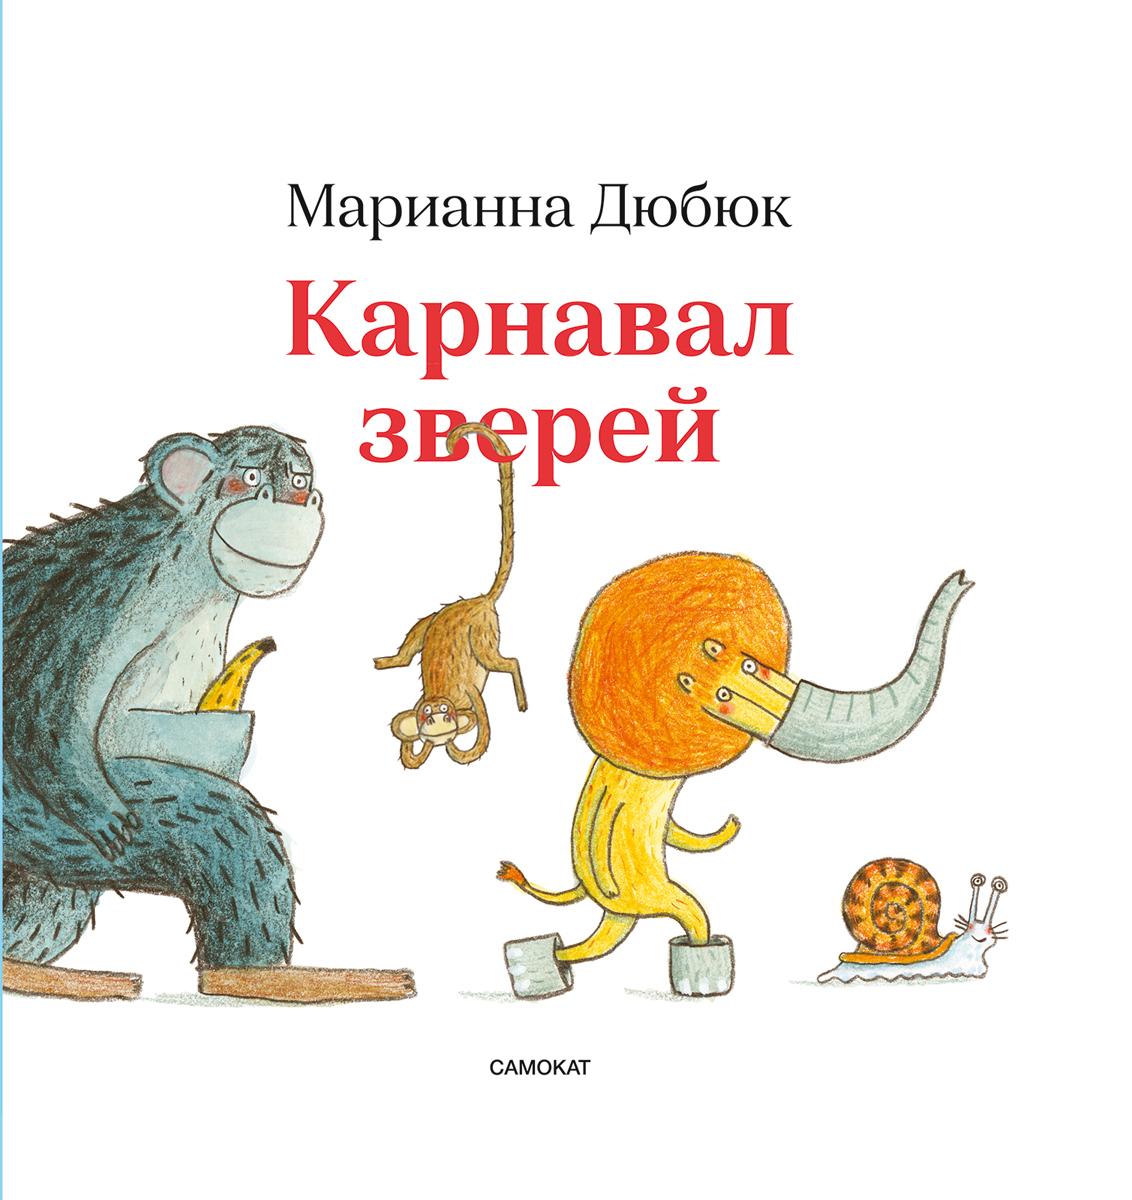 Карнавал зверей, Дюбюк, Марианна